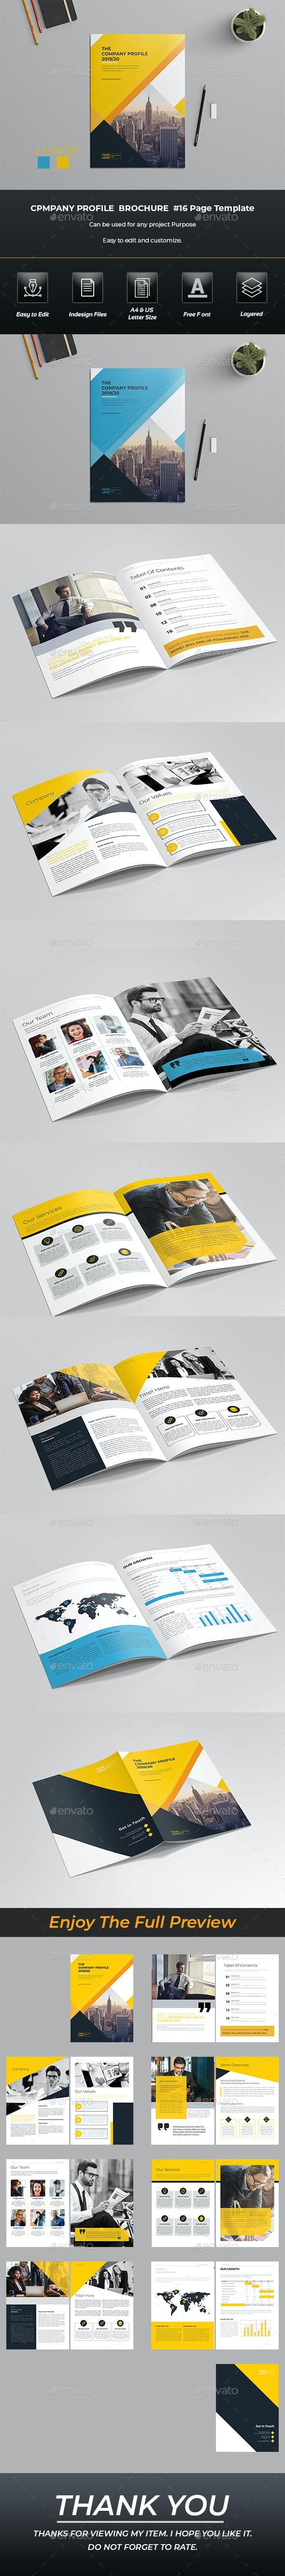 Company Profile Brochure Template Indesign - Brochures Print Templates